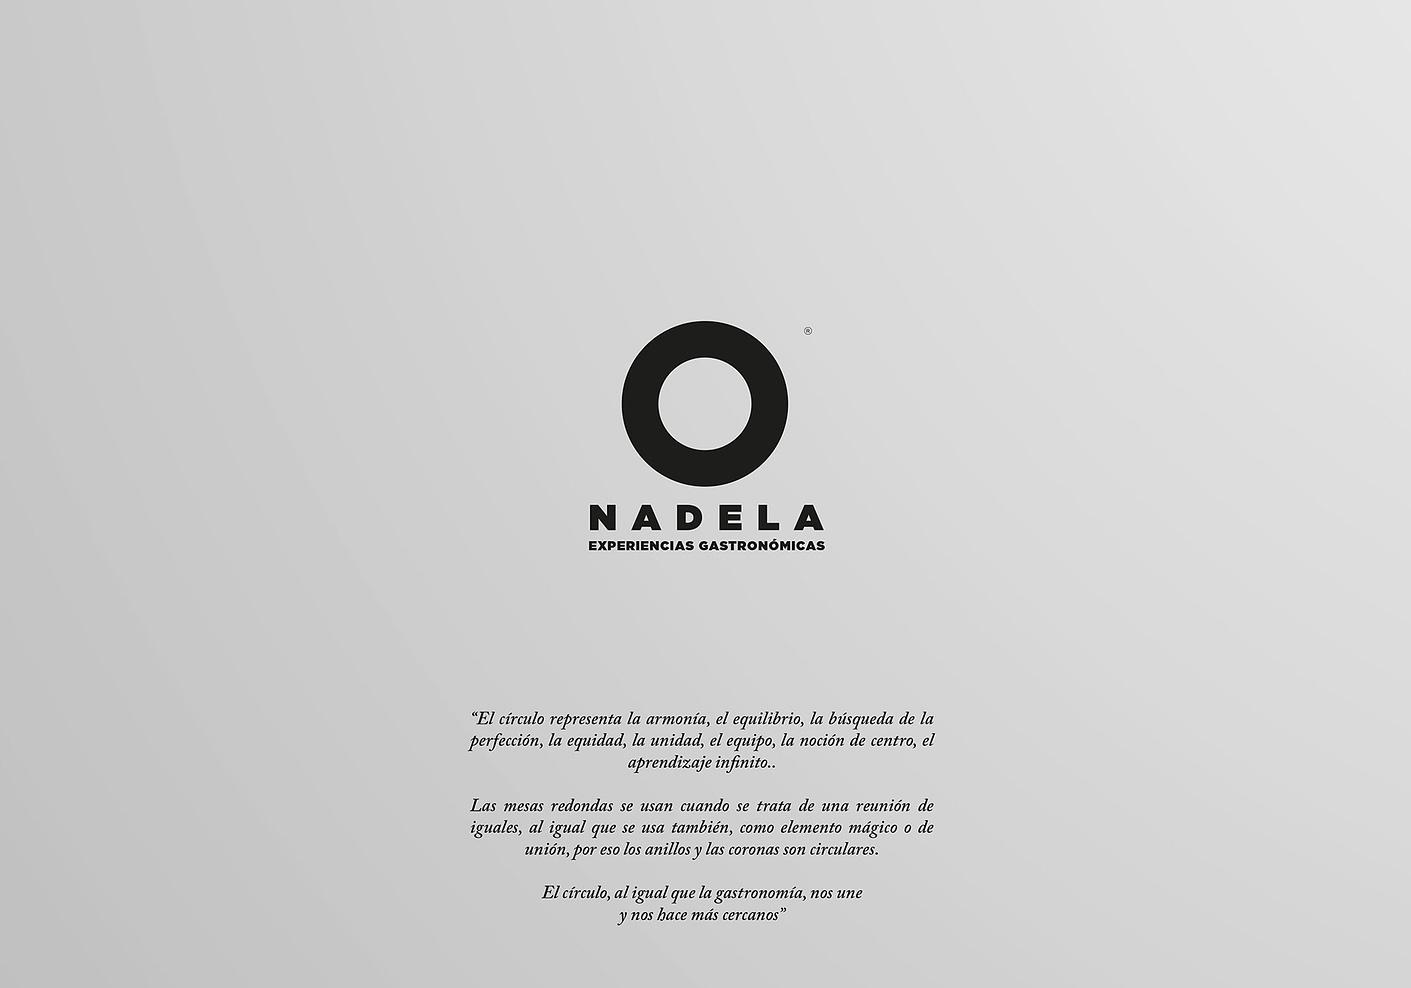 Nadela-restaurante01